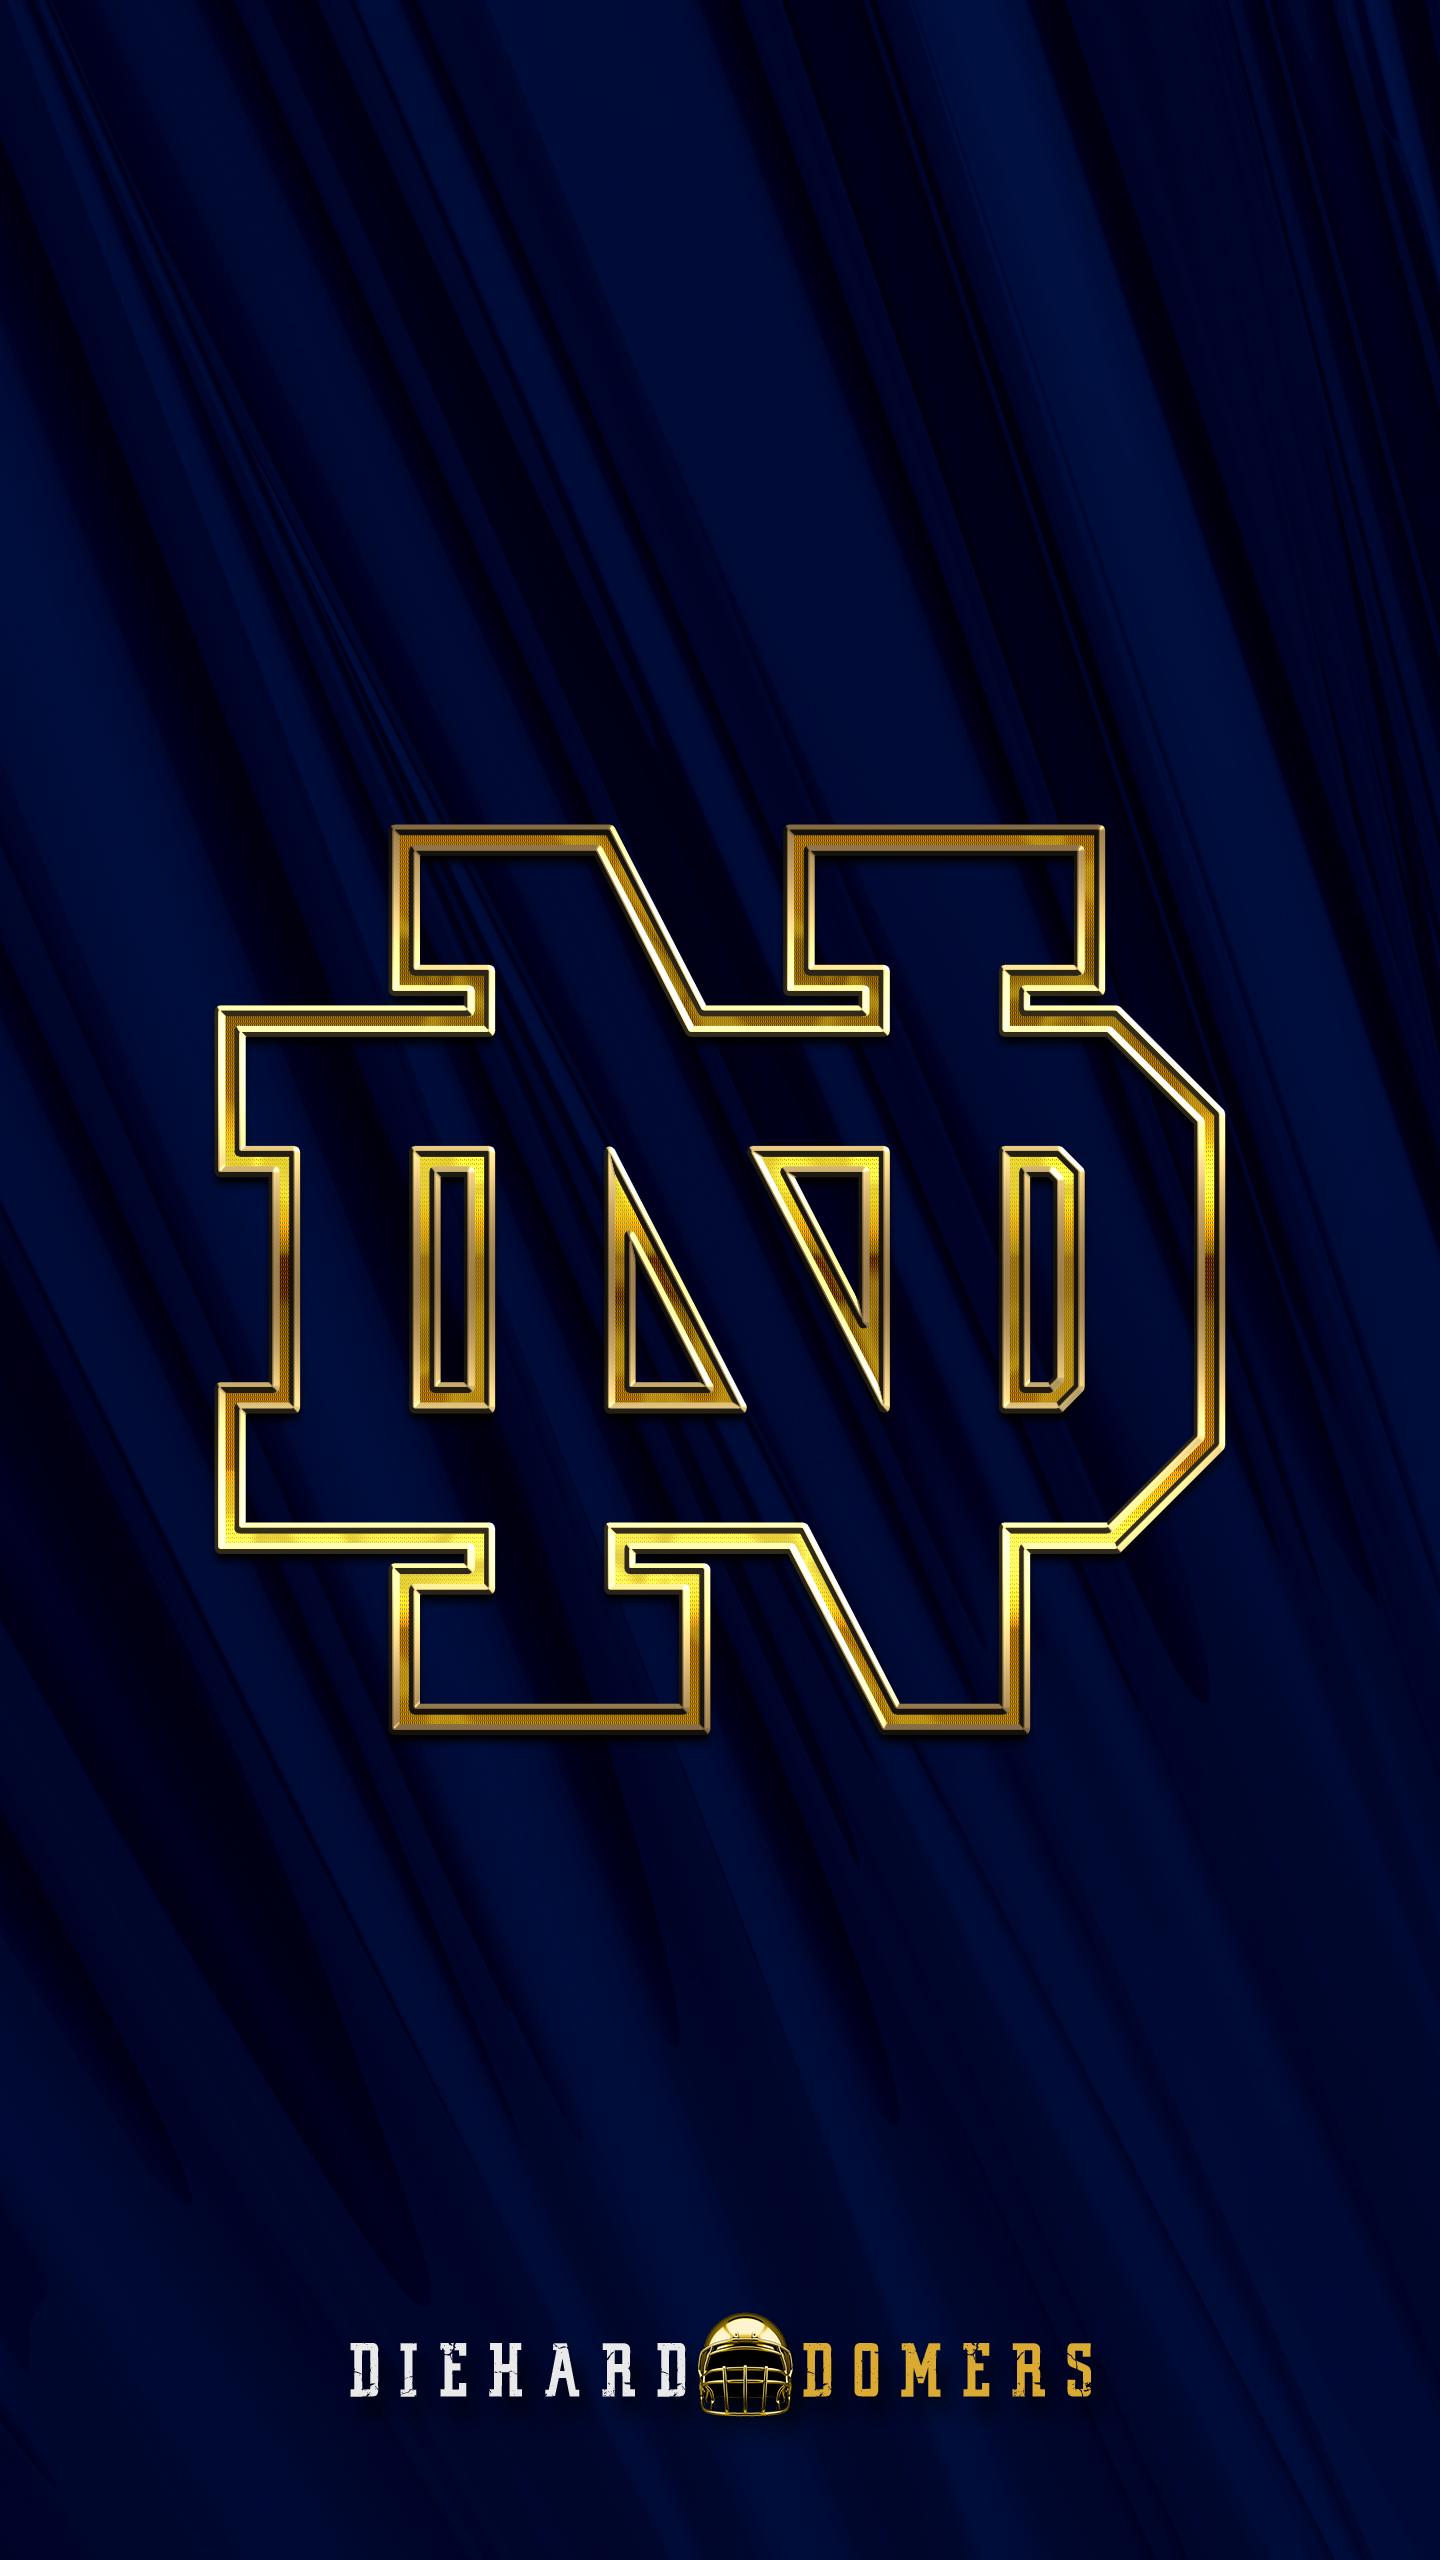 Notre Dame Wallpaper Notre Dame Fighting Irish Football Notre Dame Fighting Irish Notre Dame Wallpaper